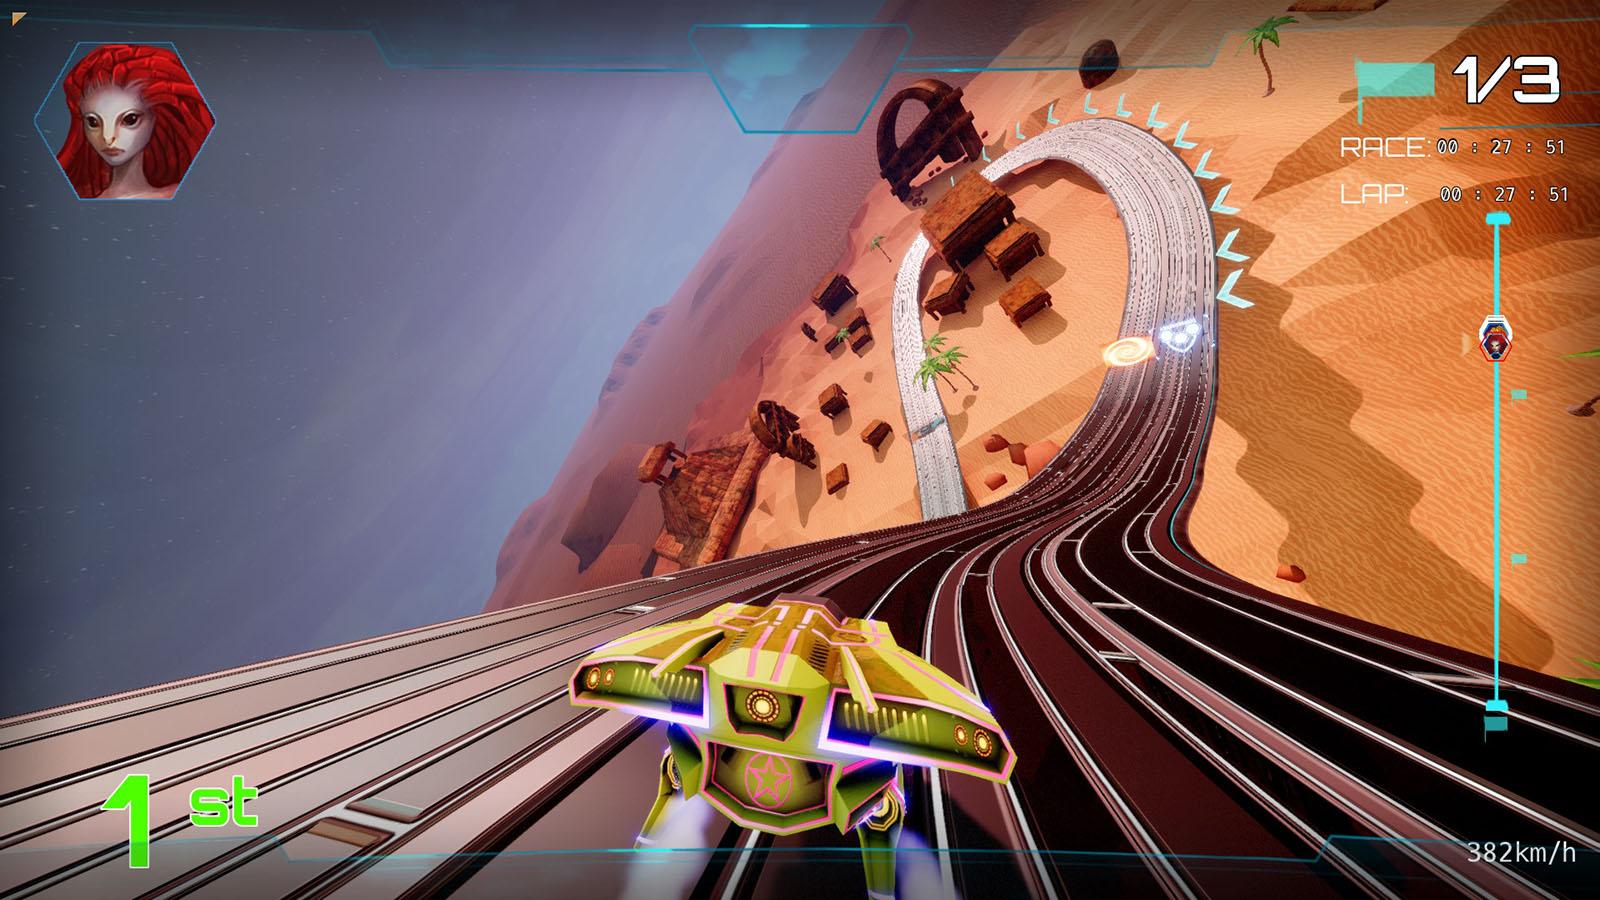 ScreenShot_GamePlay_FallenCity_169_01.jpg